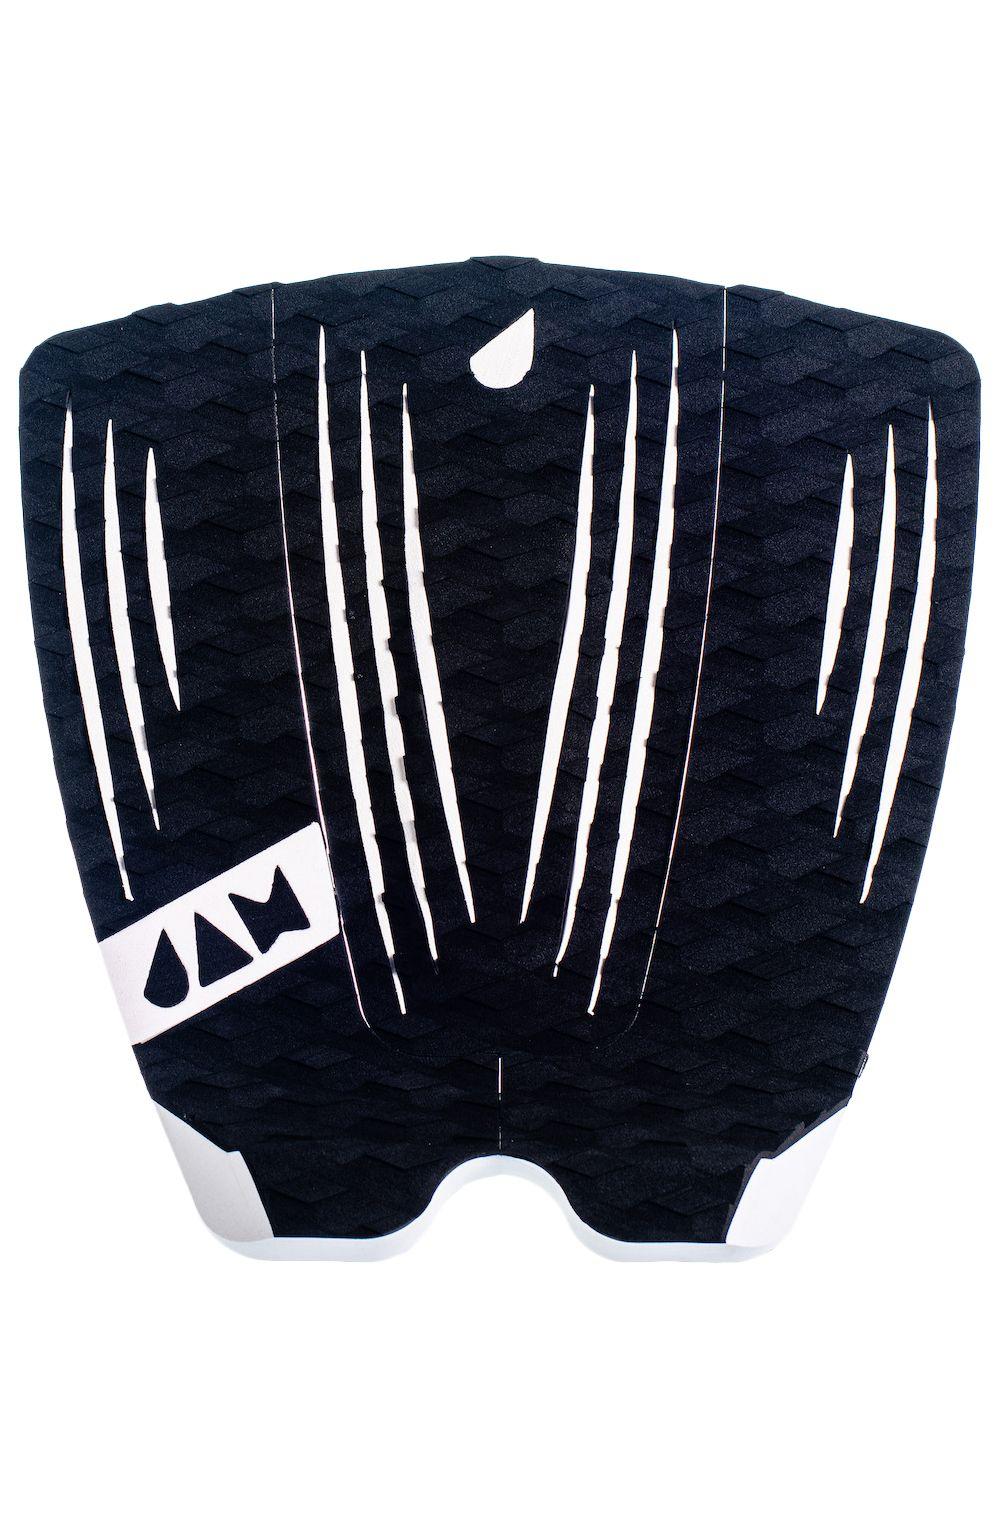 Jam Deck RECKLESS 3 PIECE Black/White Stripes